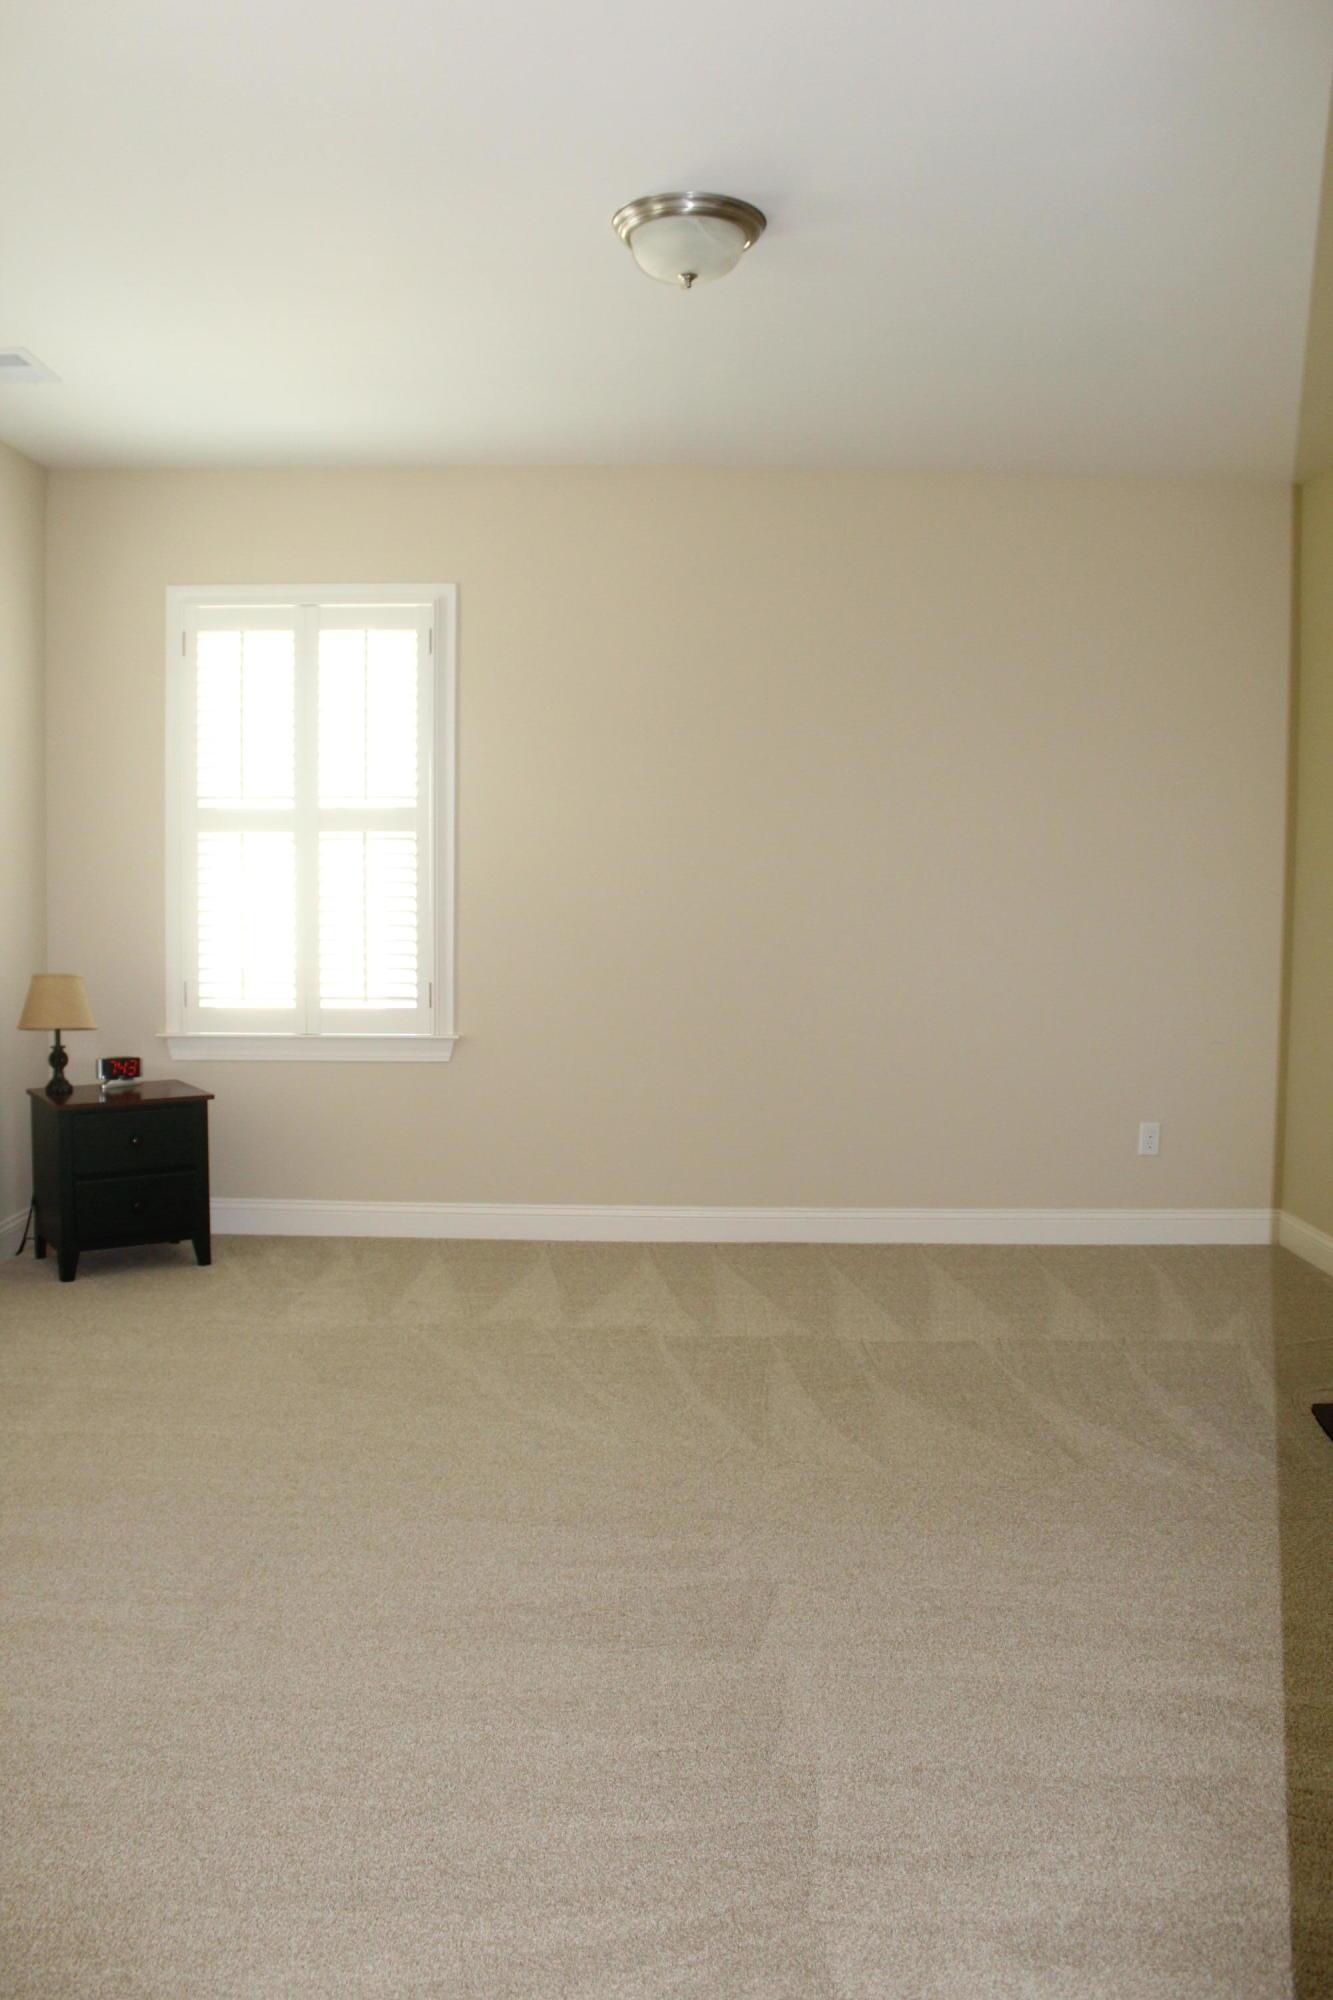 Dunes West Homes For Sale - 1403 Masthead, Mount Pleasant, SC - 31